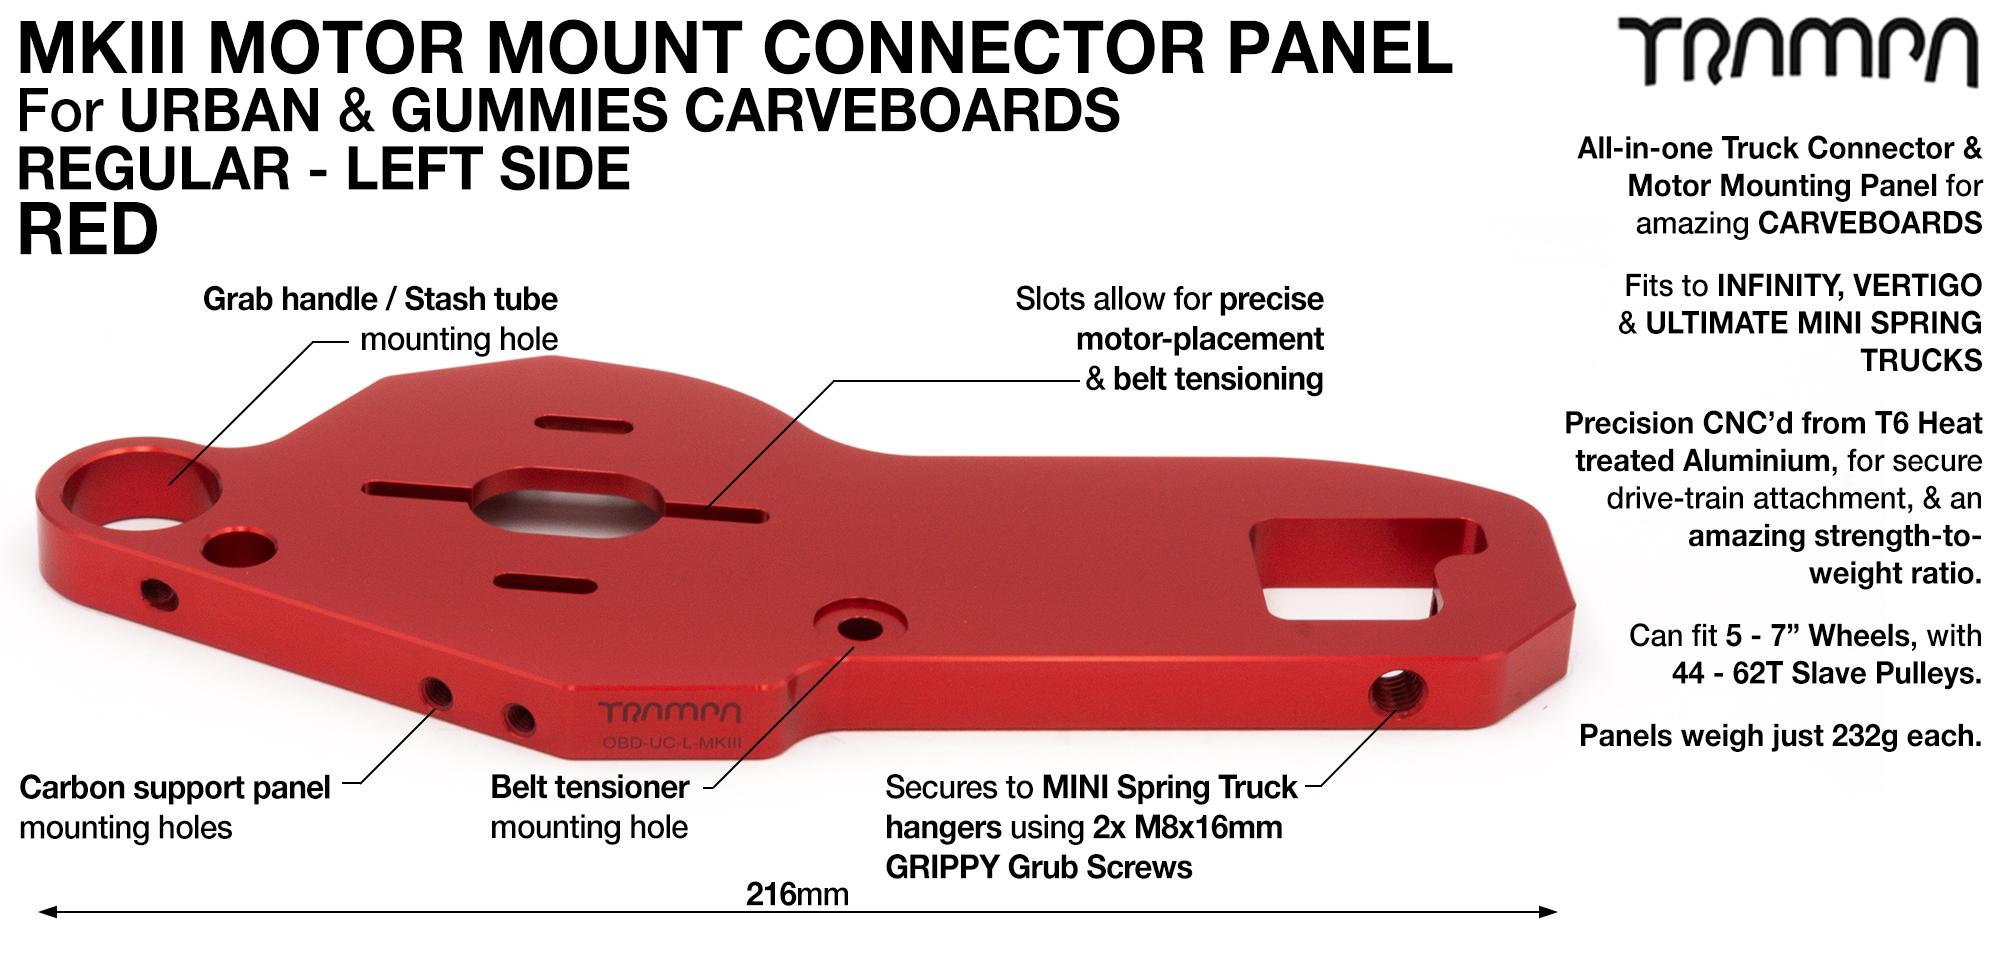 MkIII CARVE Truck Motor Mount T6 Aluminium Anodised - REGULAR RED